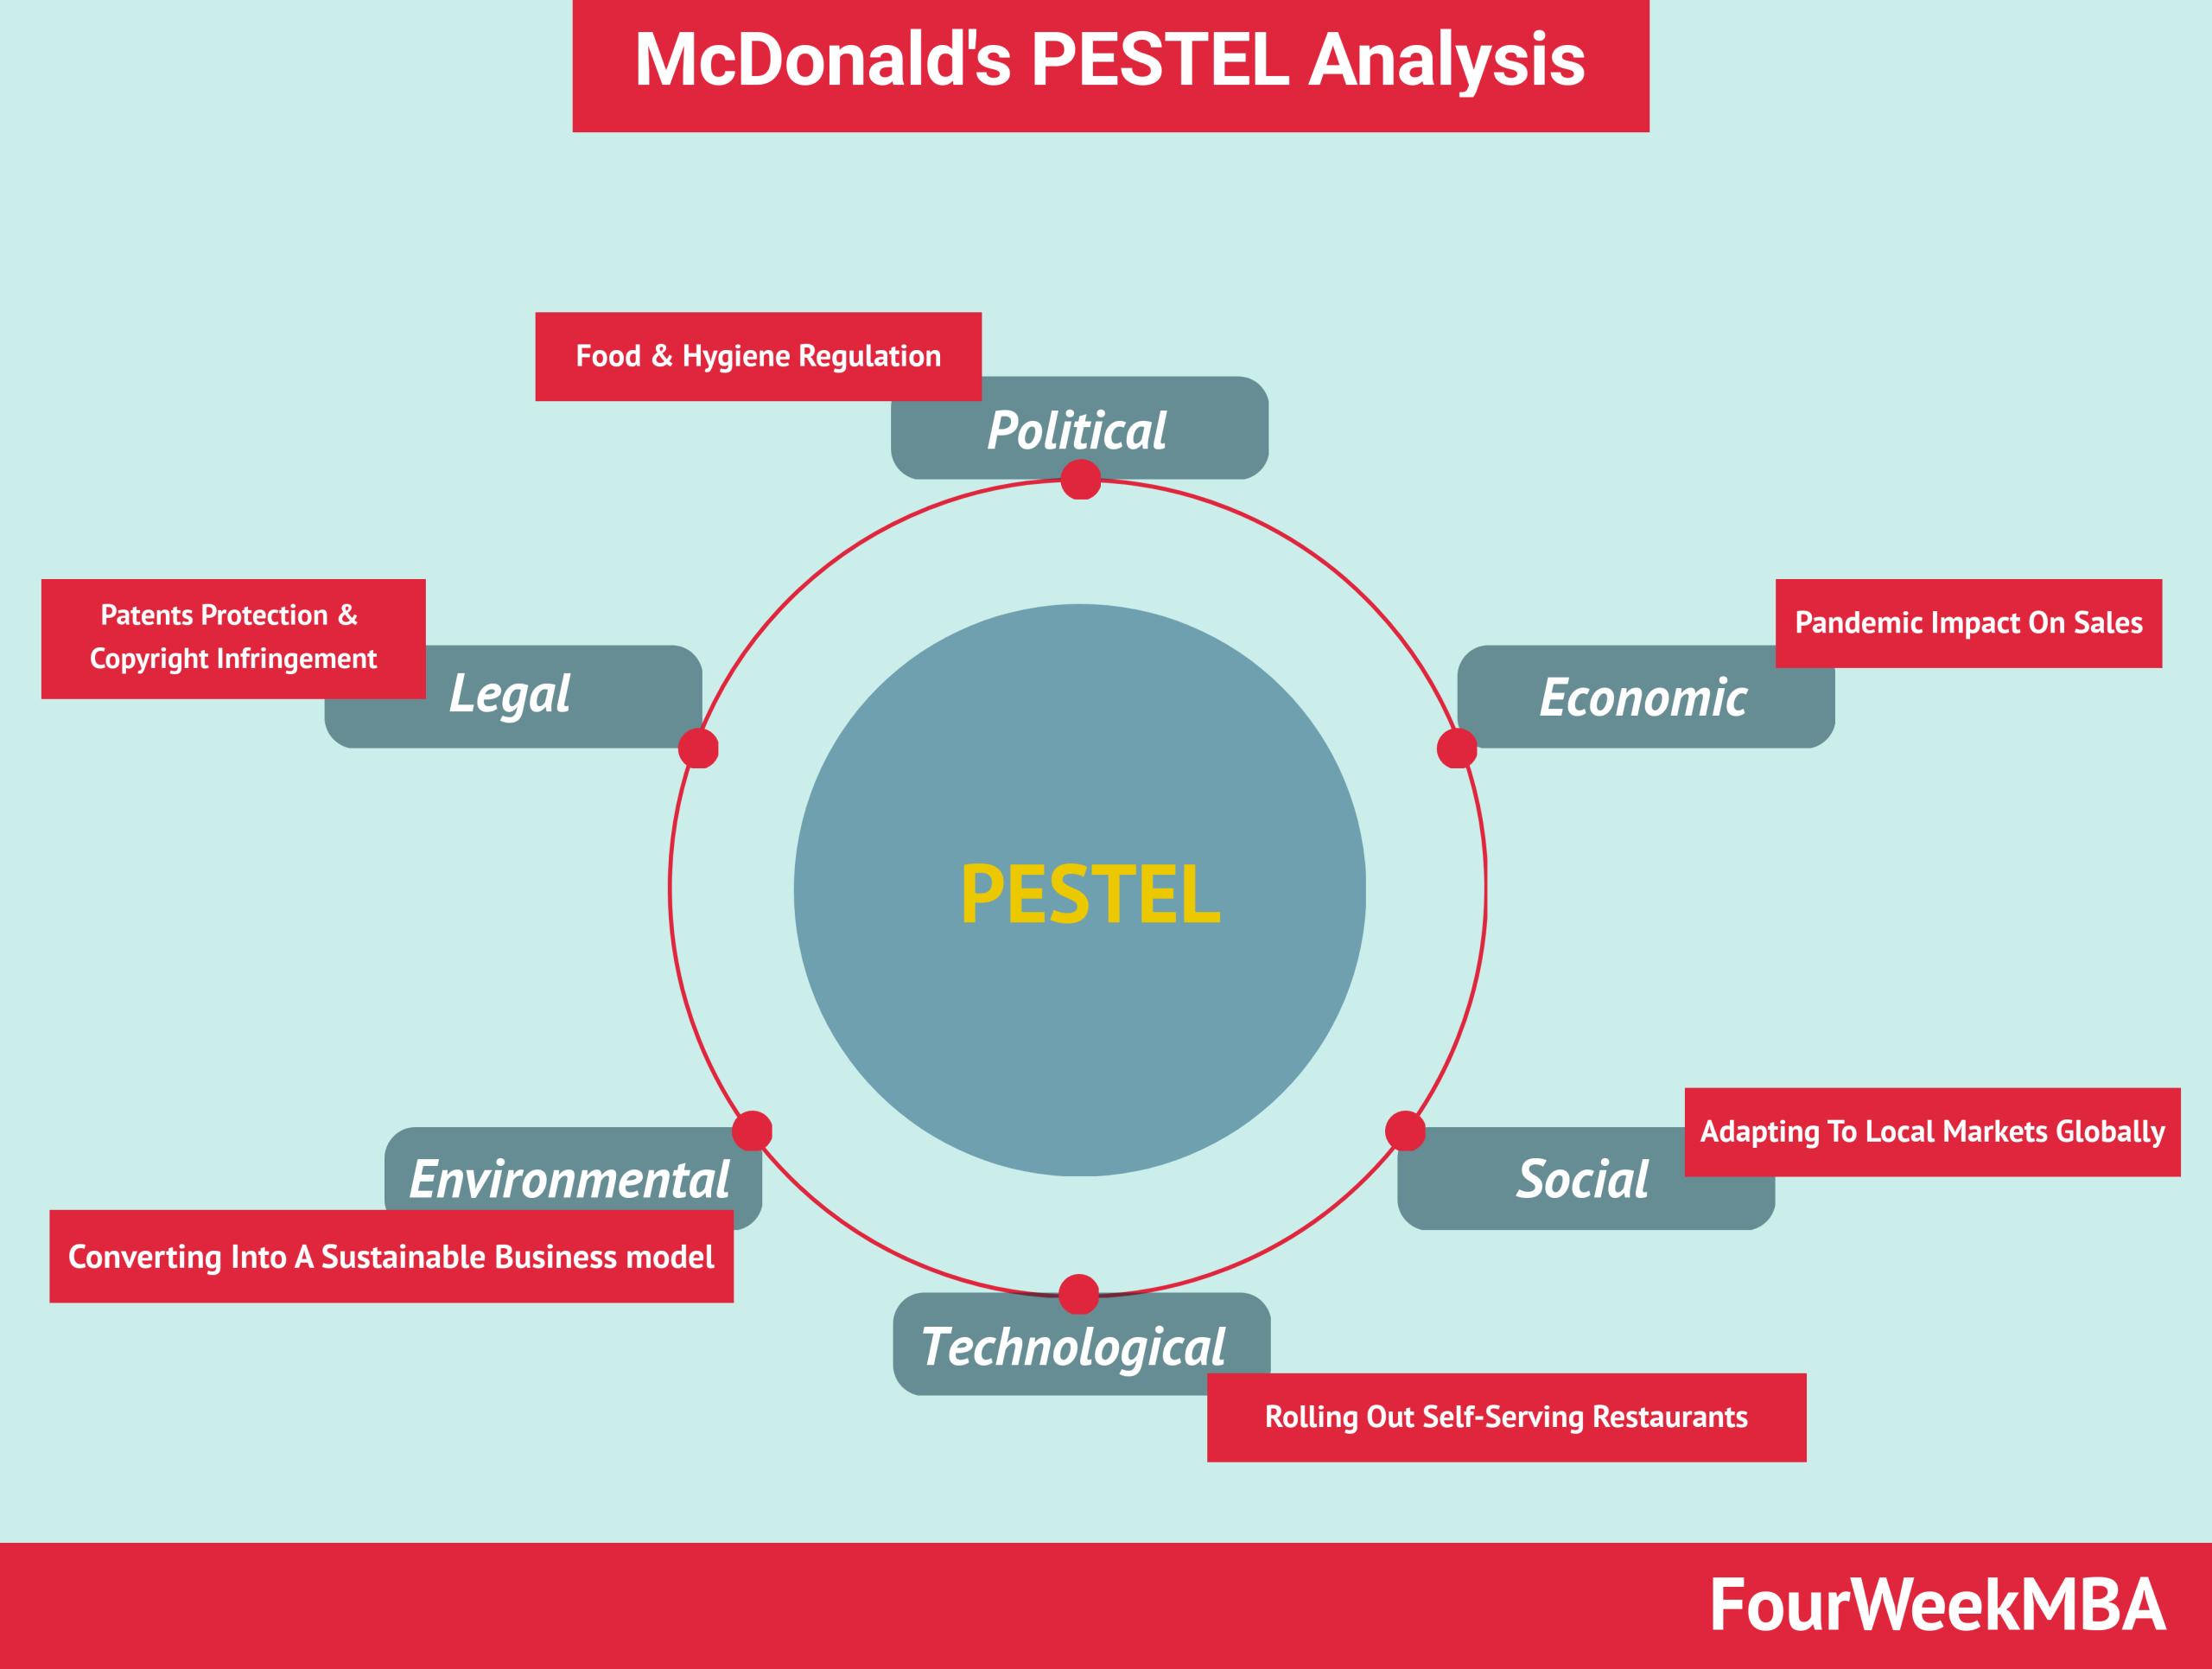 mcdonalds-pestel-analysis